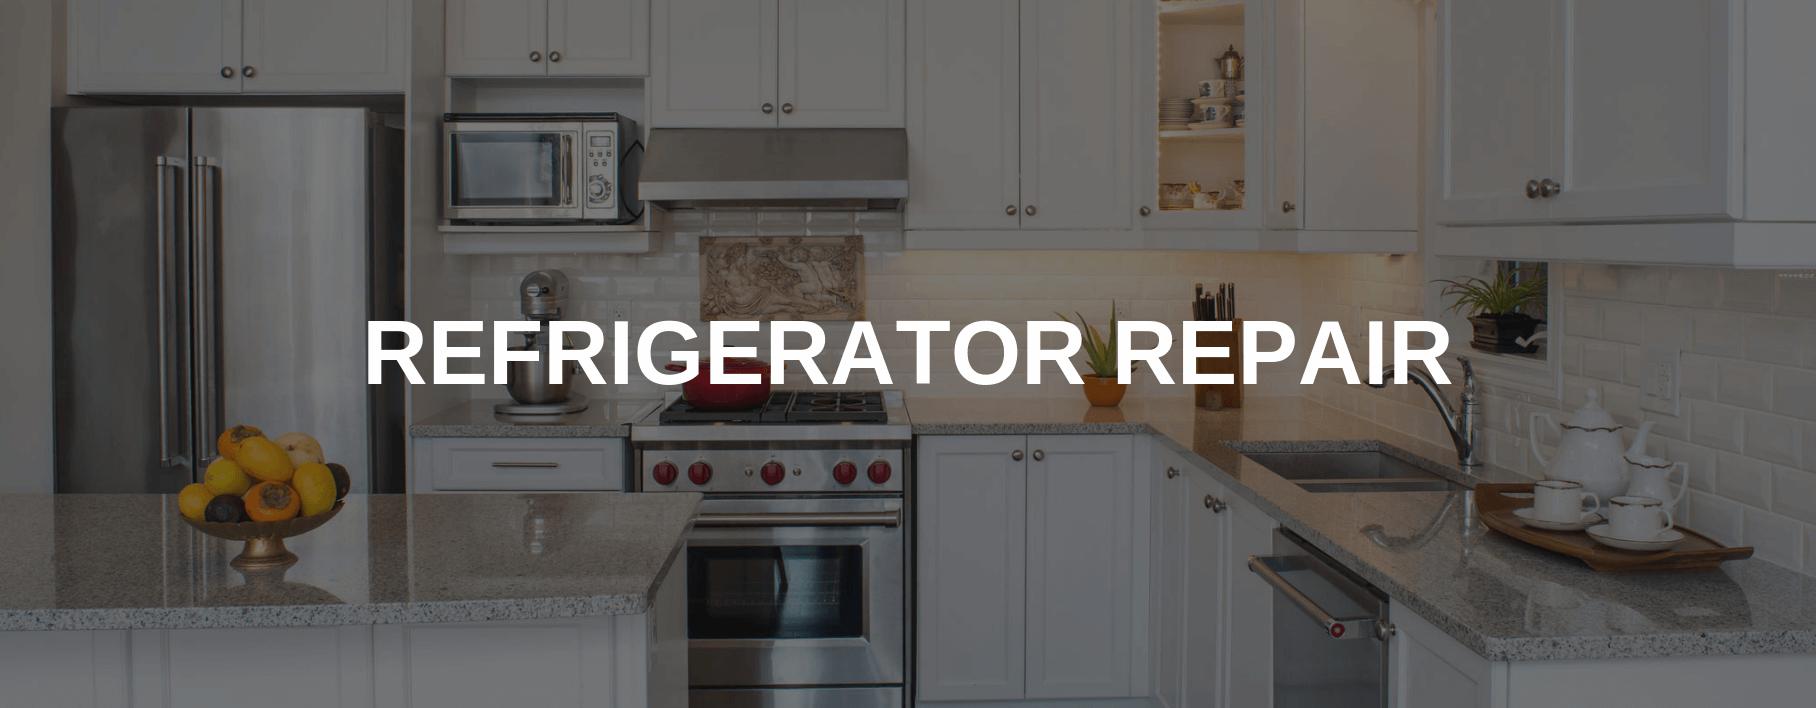 mansfield refrigerator repair